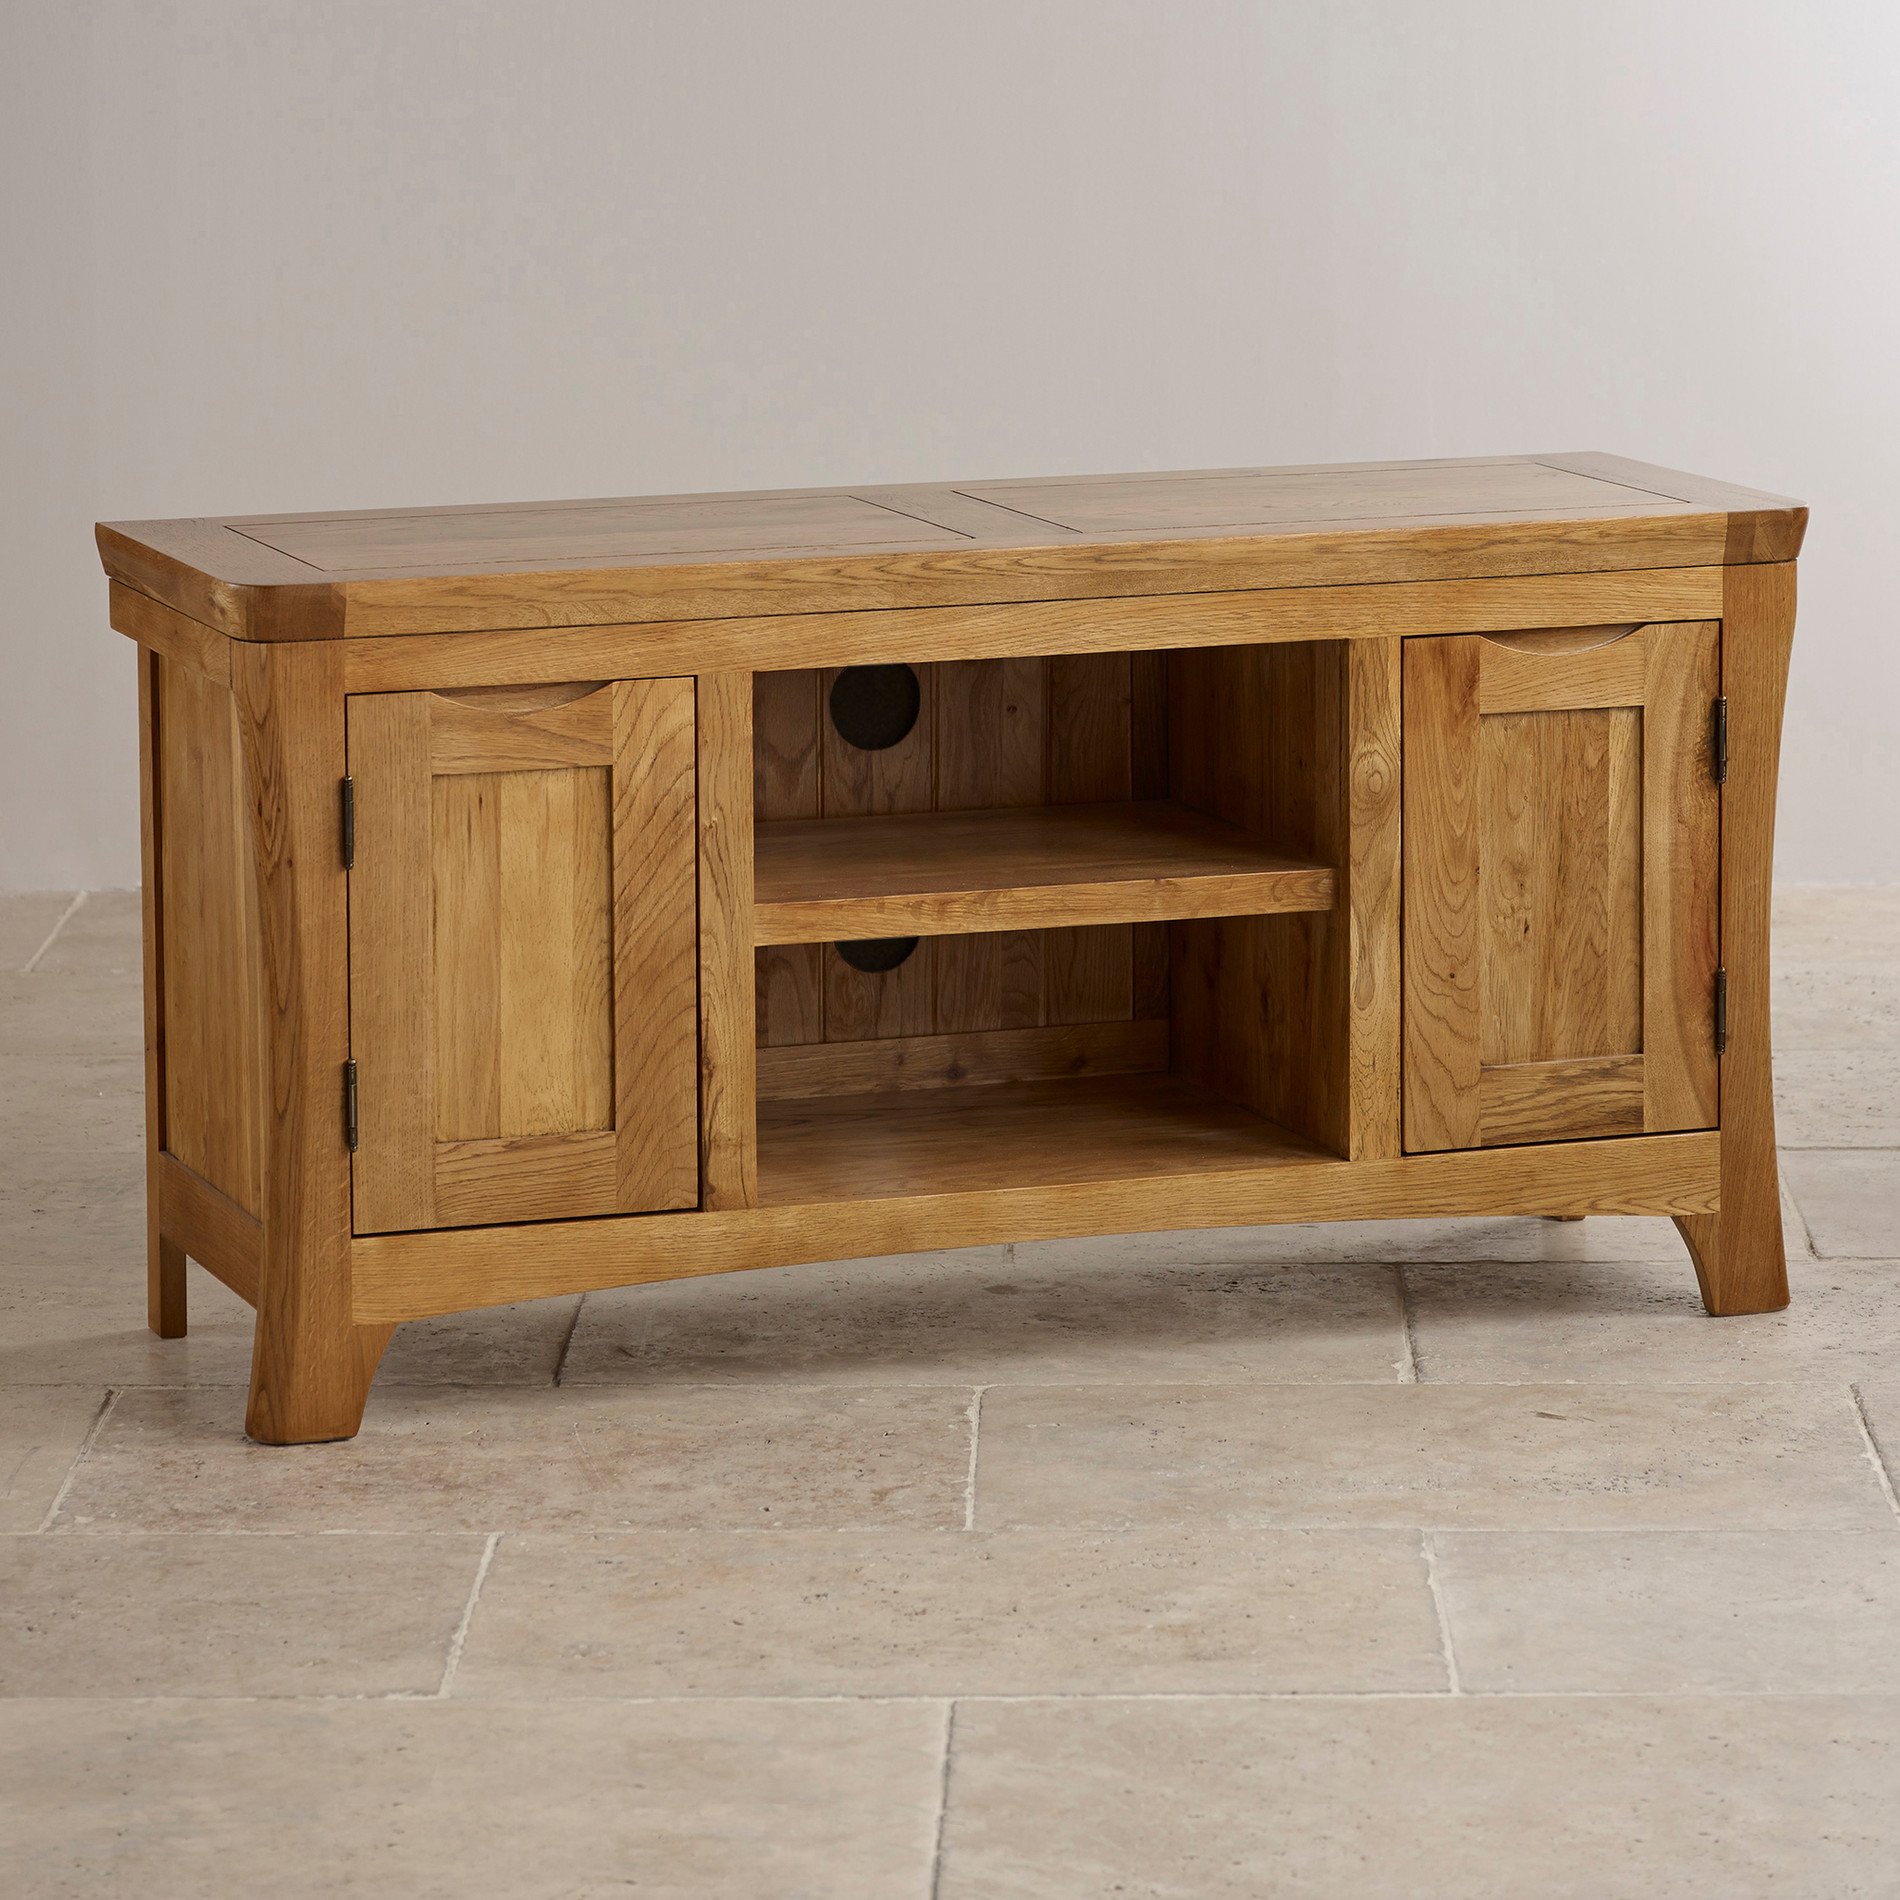 Orrick Wide TV Cabinet in Rustic Solid Oak | Oak Furniture Land